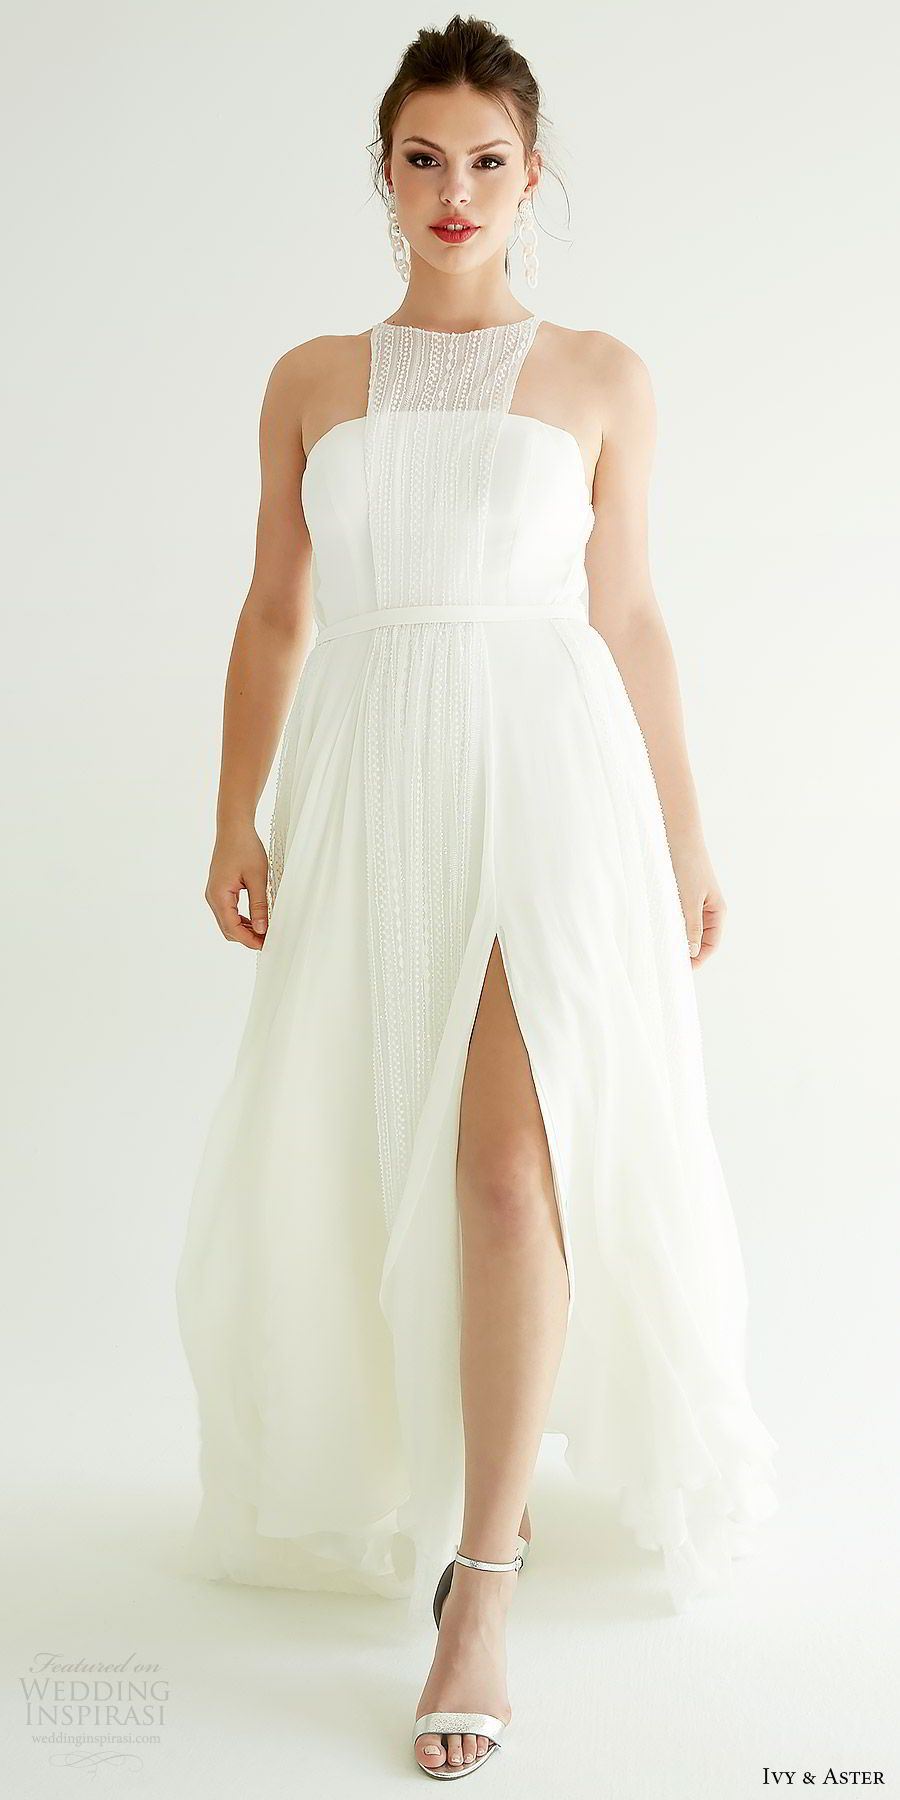 Ivy Aster Spring 2019 Wedding Dresses Ixa Revolution Bridal Collection Wedding Inspirasi Wedding Dresses Dresses White Wedding Gowns [ 1800 x 900 Pixel ]